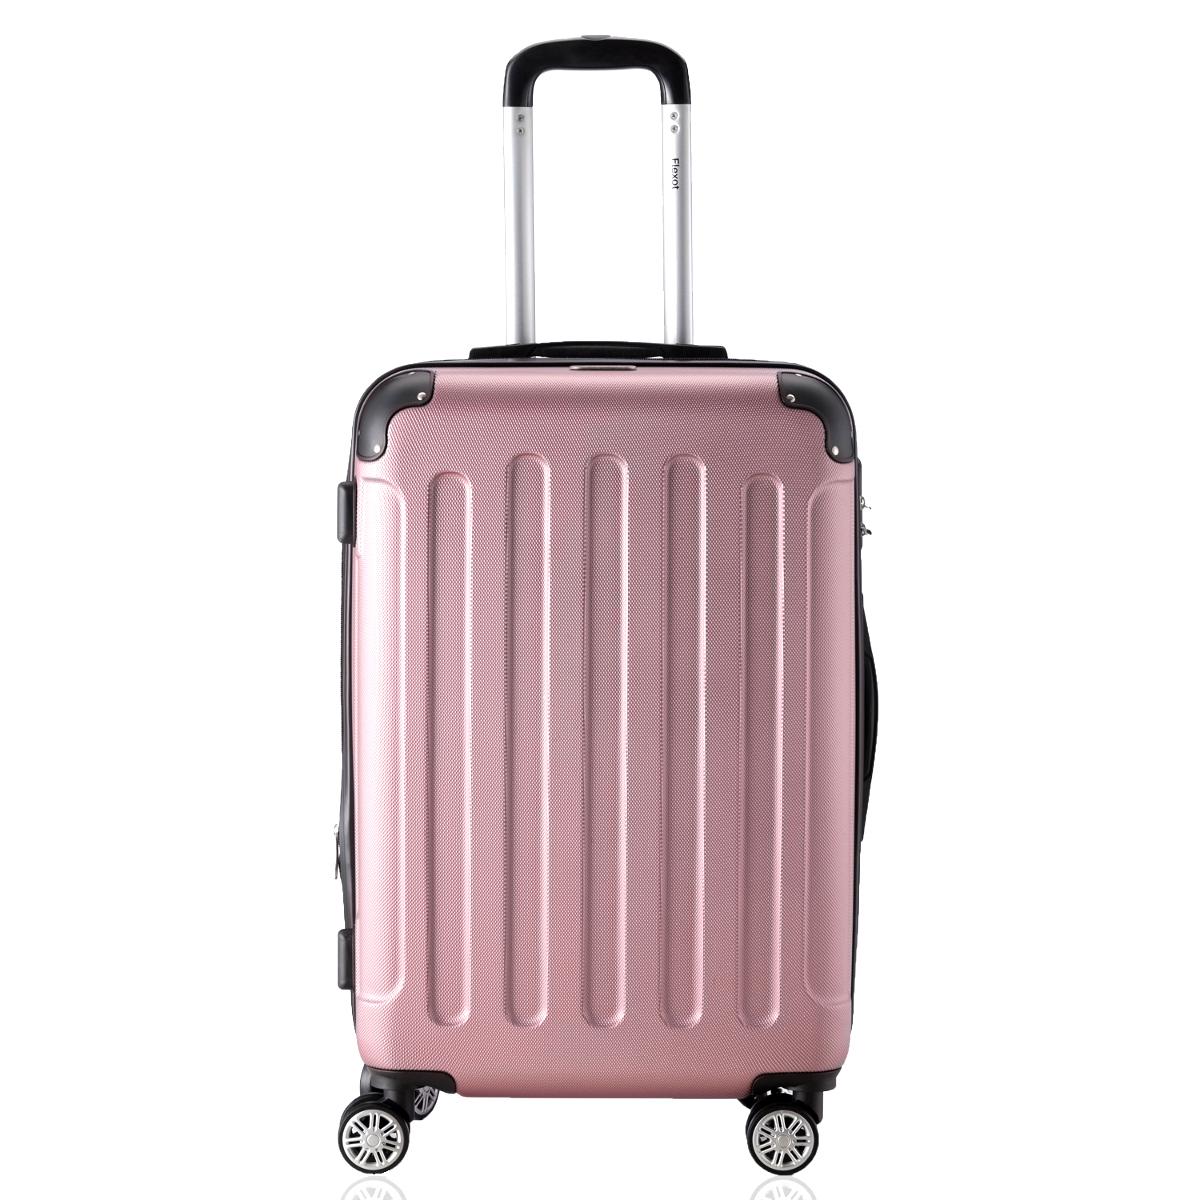 Koffer-Flexot-2045-Hartschalenkoffer-Trolley-Kofferset-Reisekoffer-M-L-XL-Set Indexbild 24